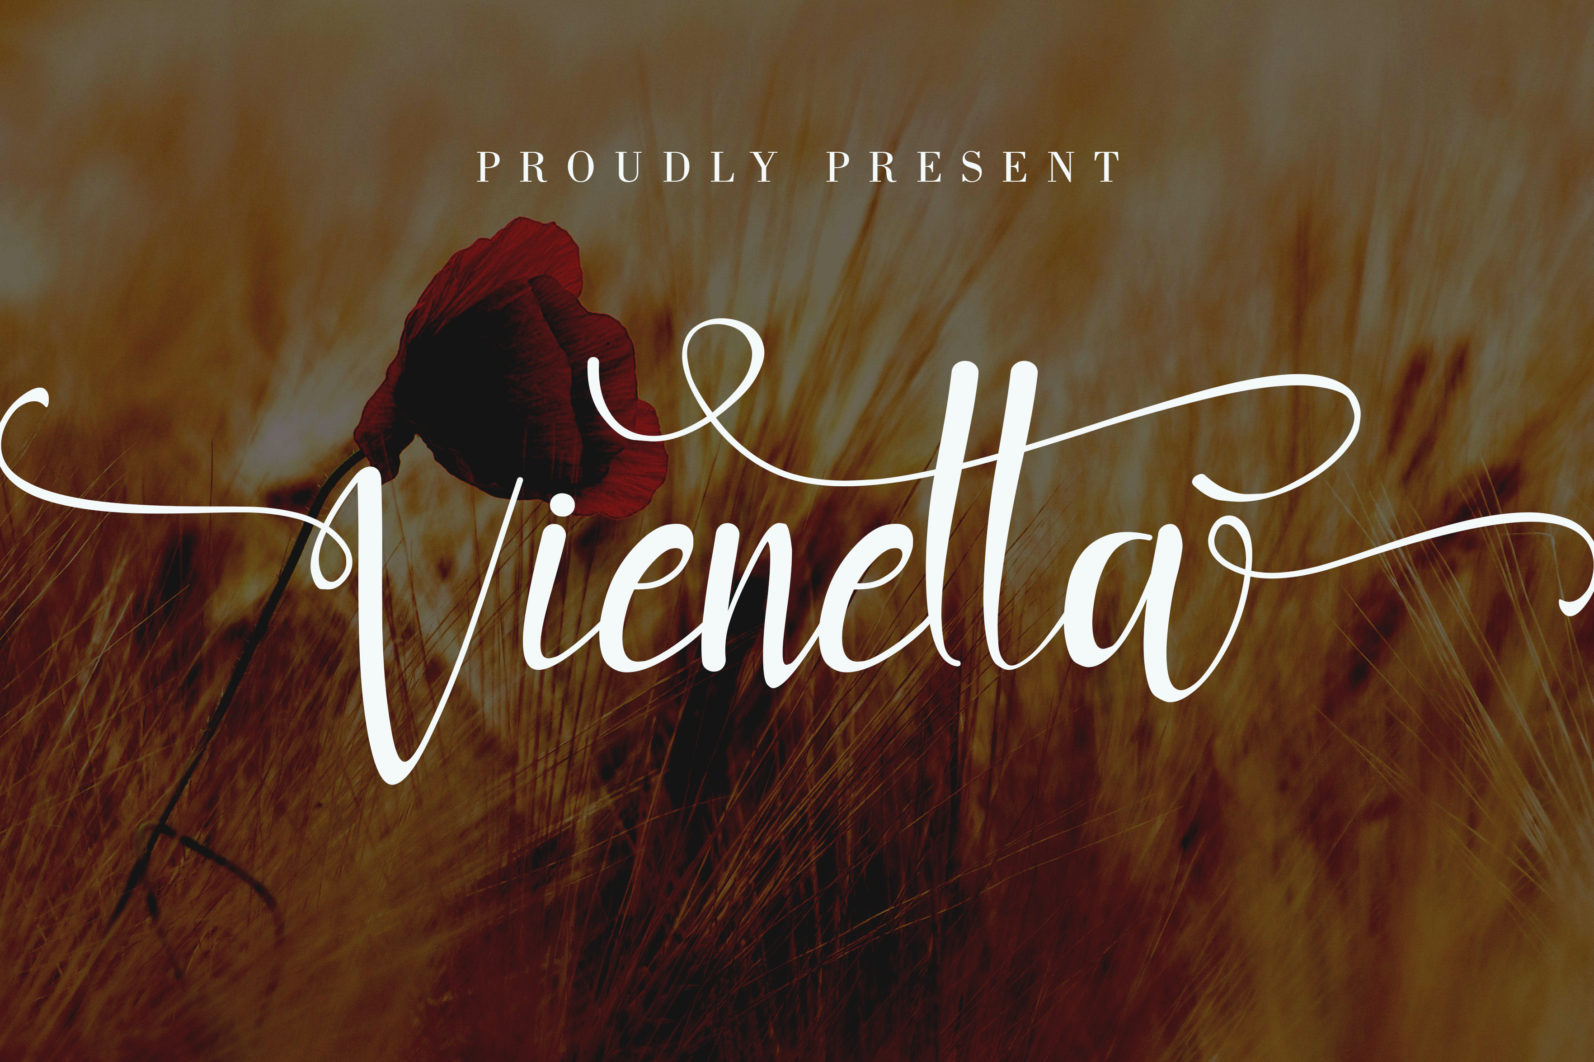 Beautiful Script Font Bundle - preview 1 1 4 scaled -